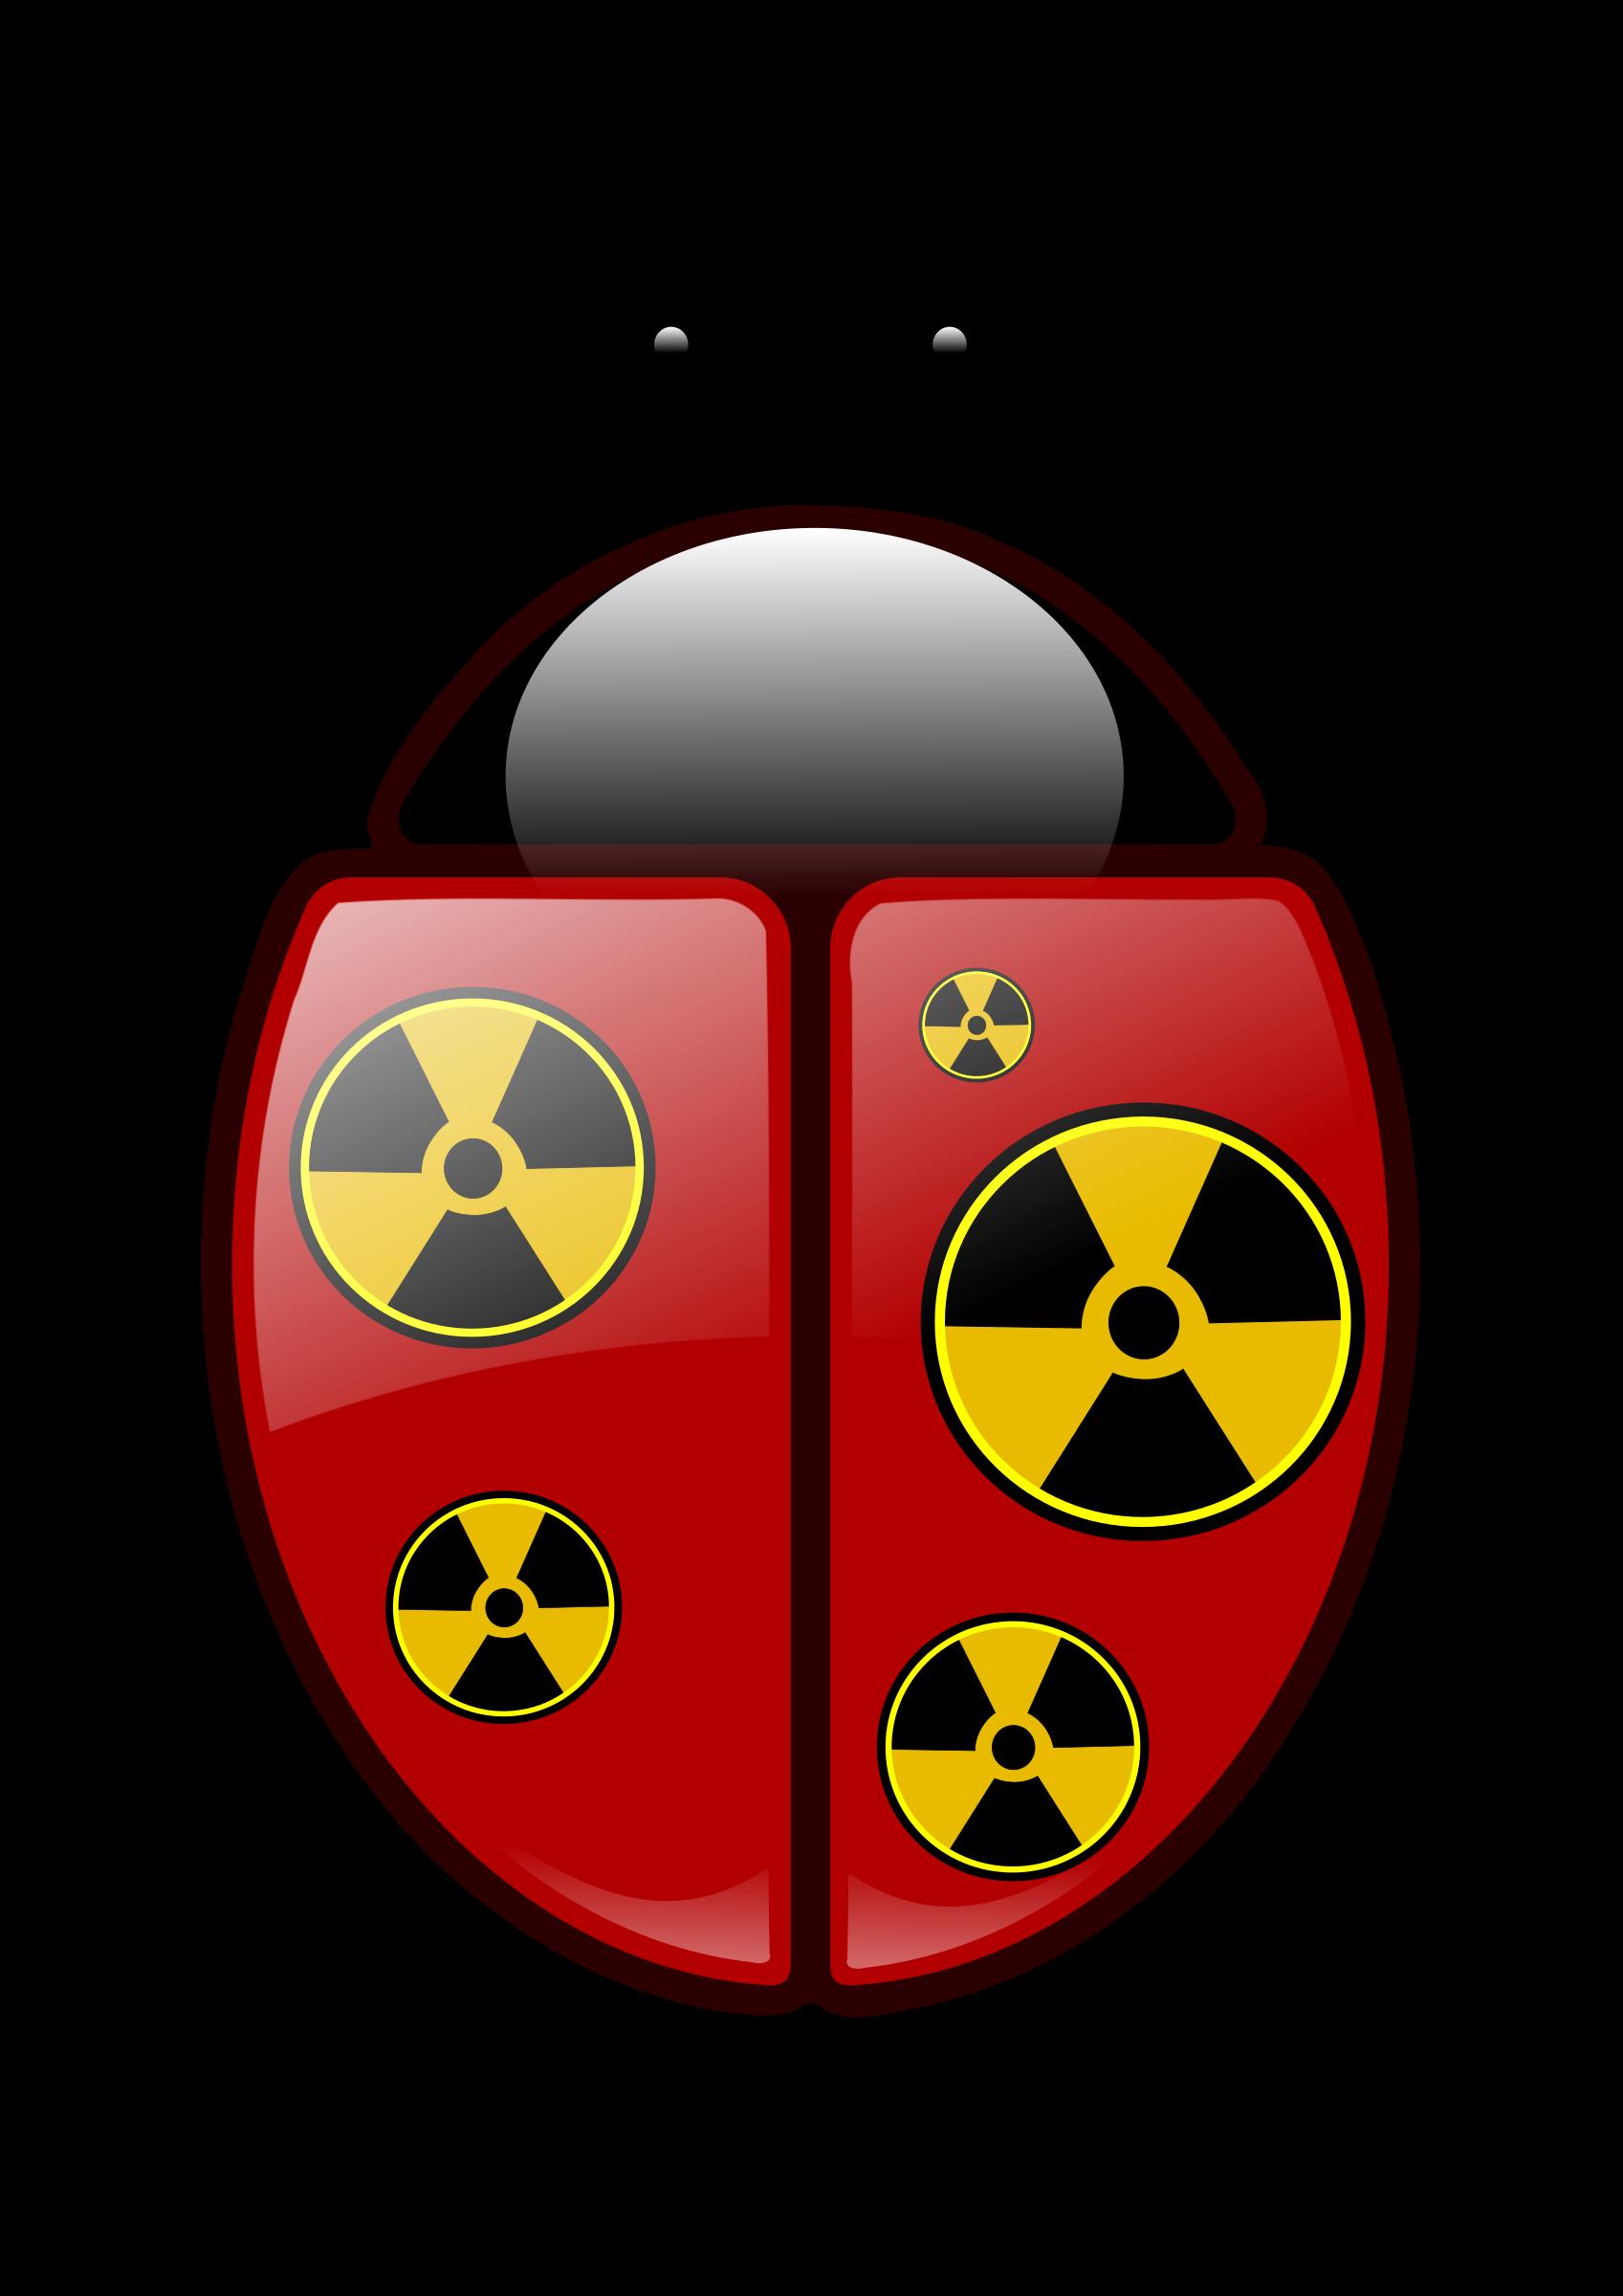 Radioactive clipart Clipart Ladybug Ladybug Radioactive Radioactive